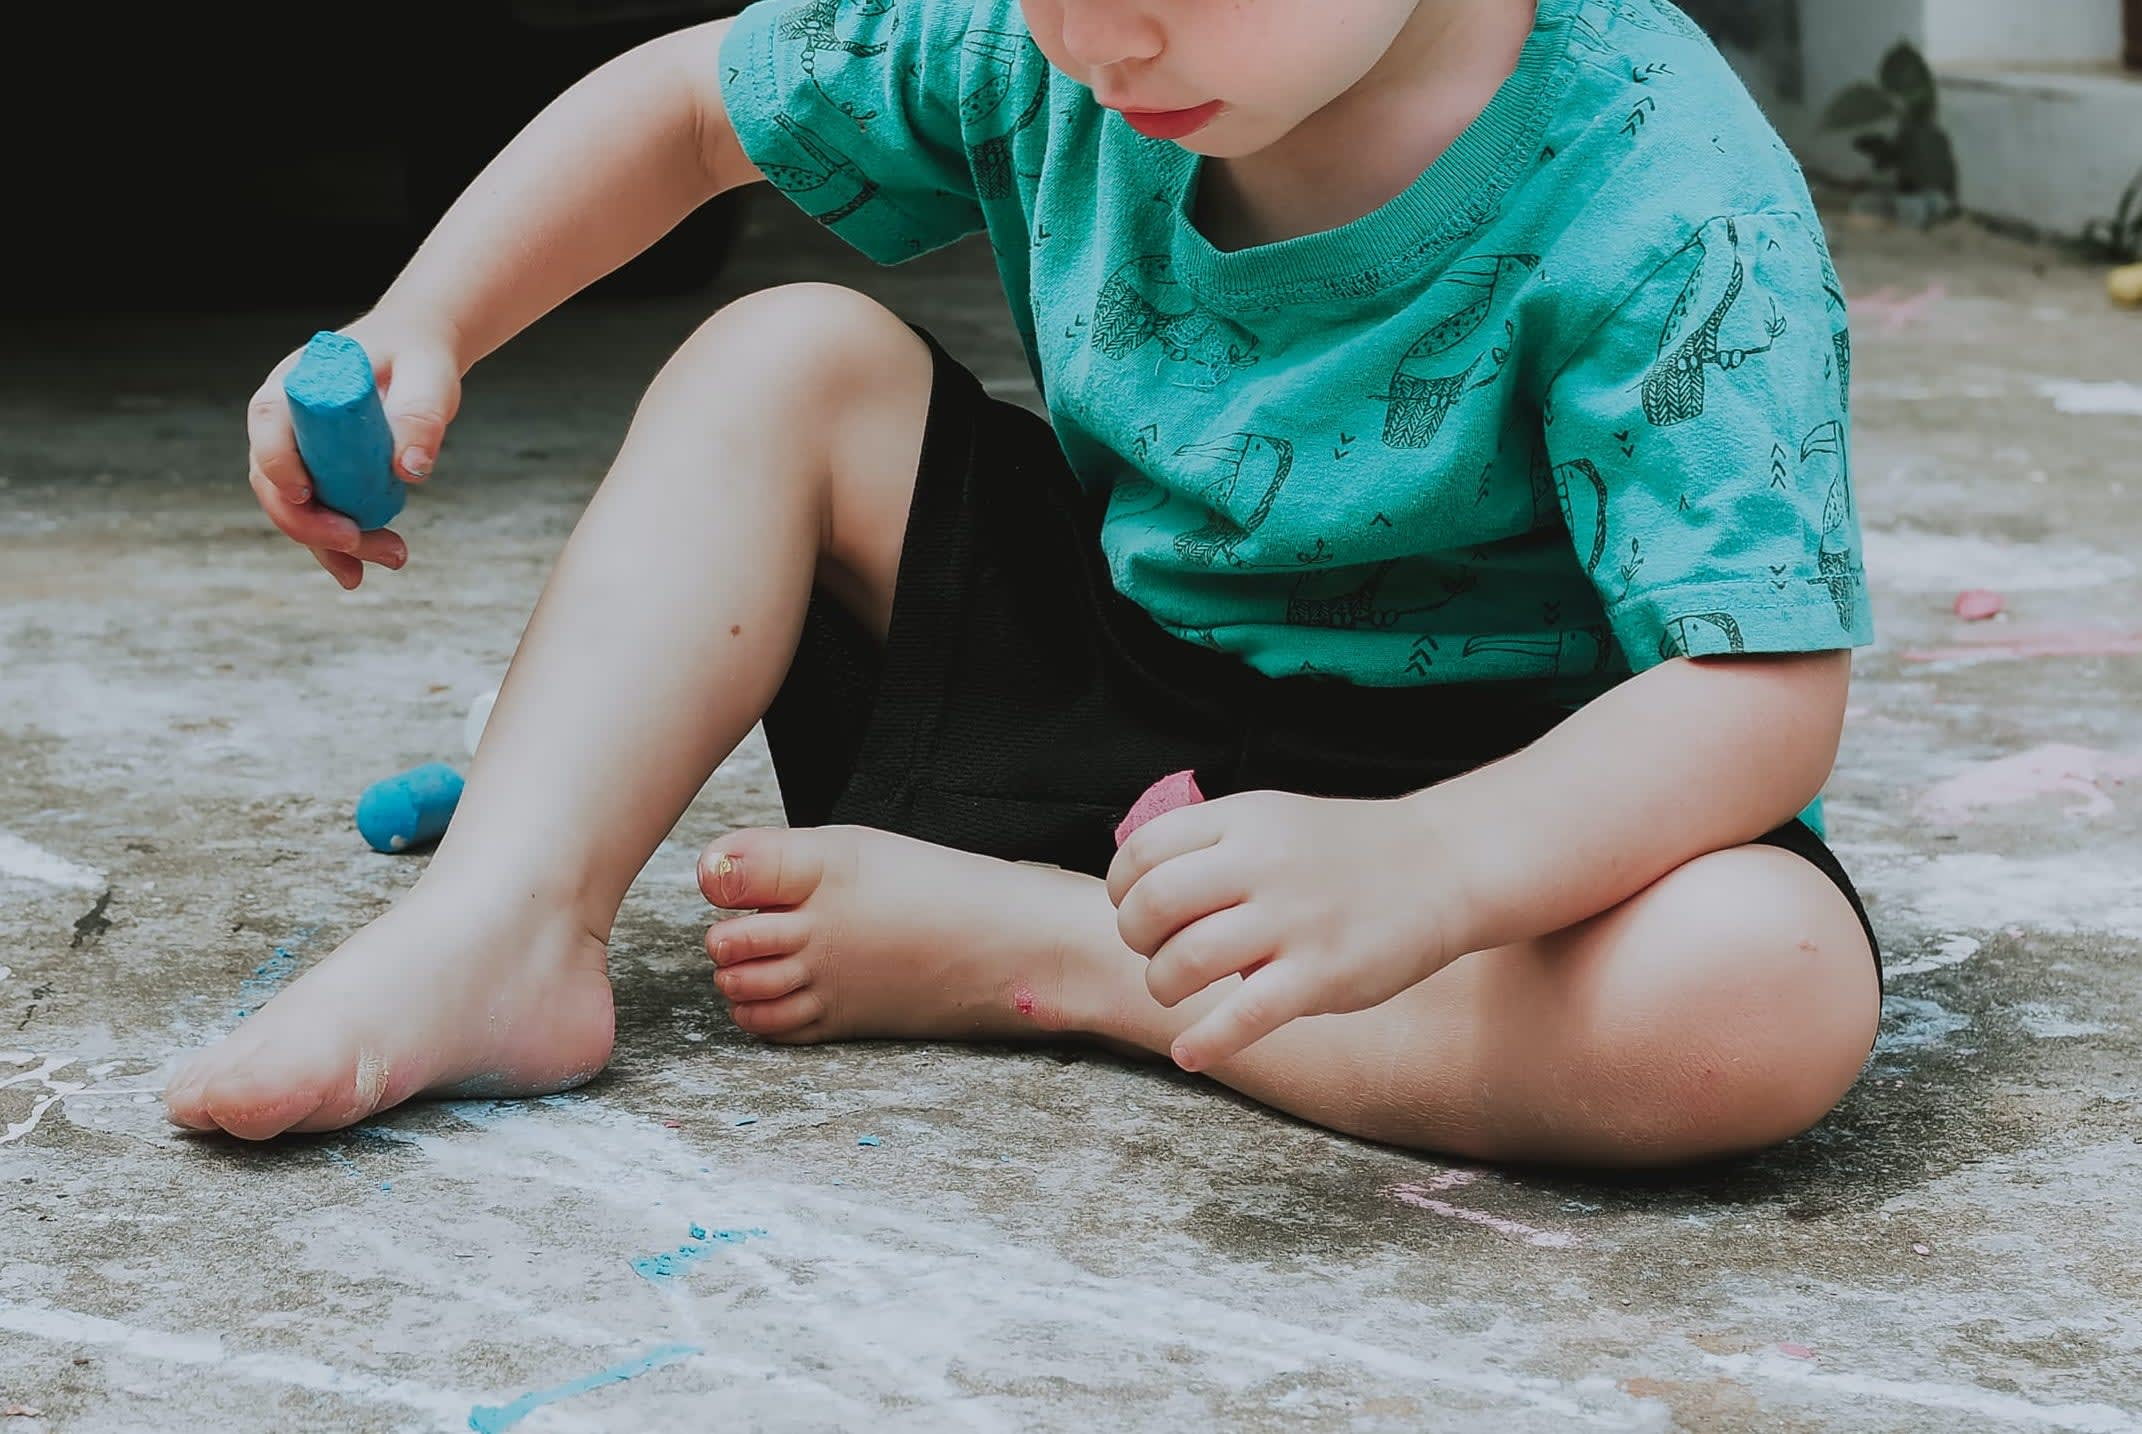 young boy sitting on floor